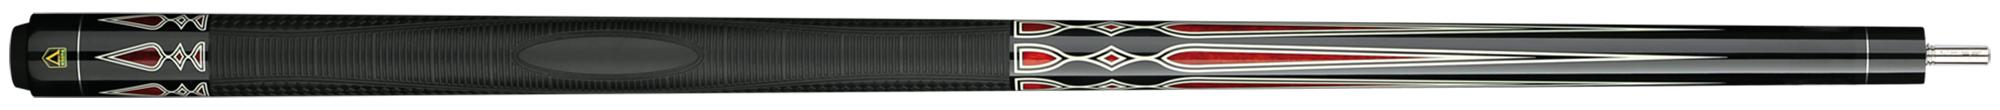 CK1065: Renzline Bison Libre-II #2 #1